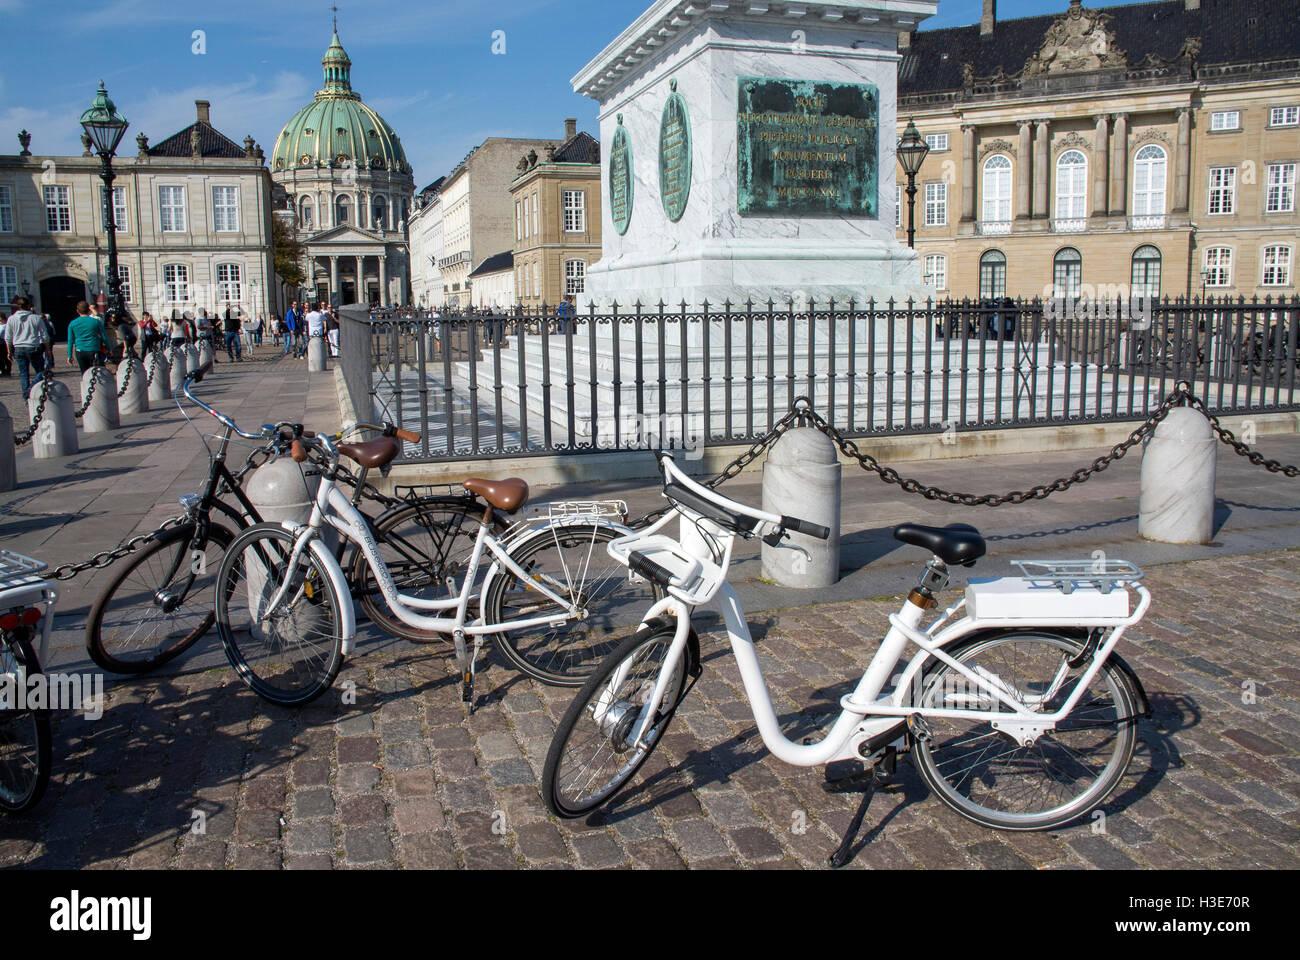 Bikes in the Amalienborg Palace, Copenhagen, Denmark. - Stock Image